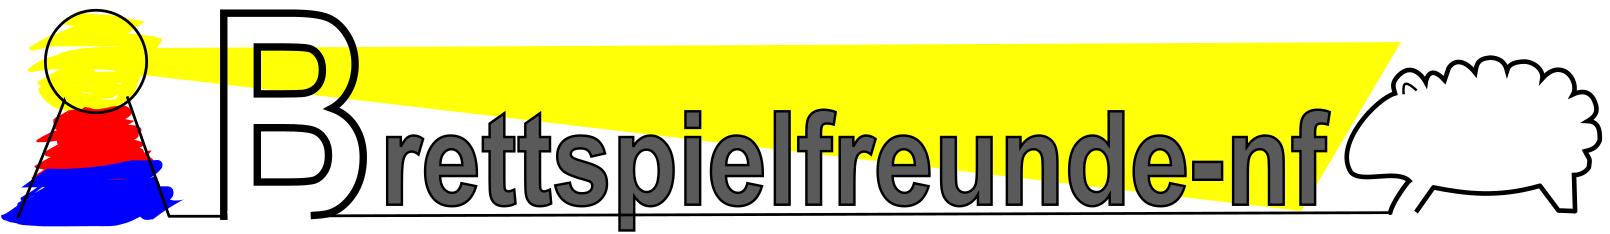 Brettspielfreunde Nordfriesland e.V.